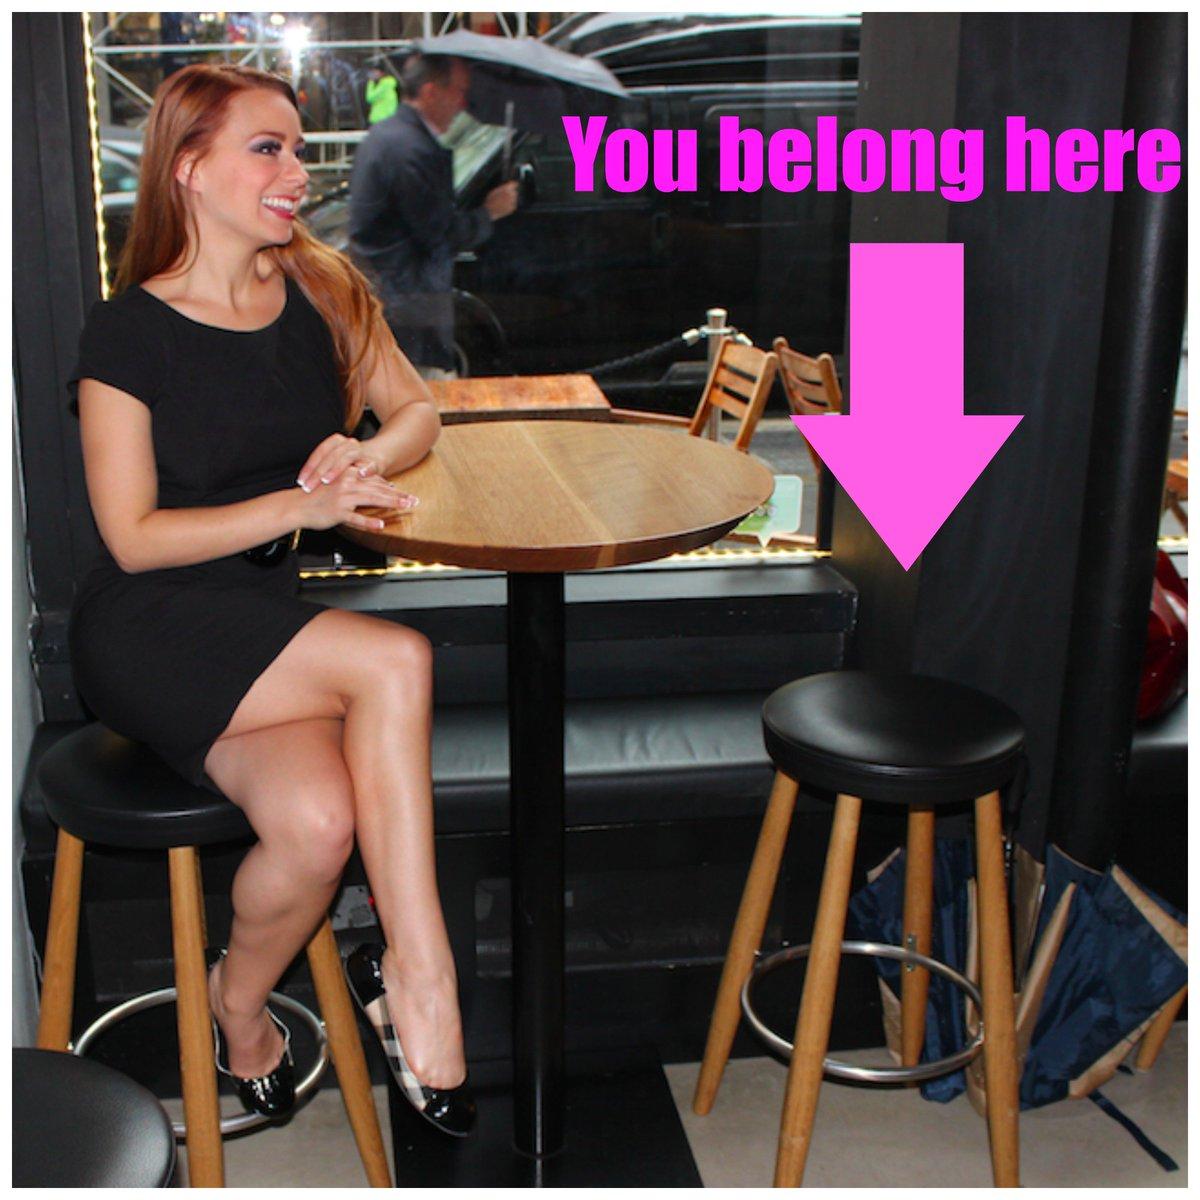 footsie under table